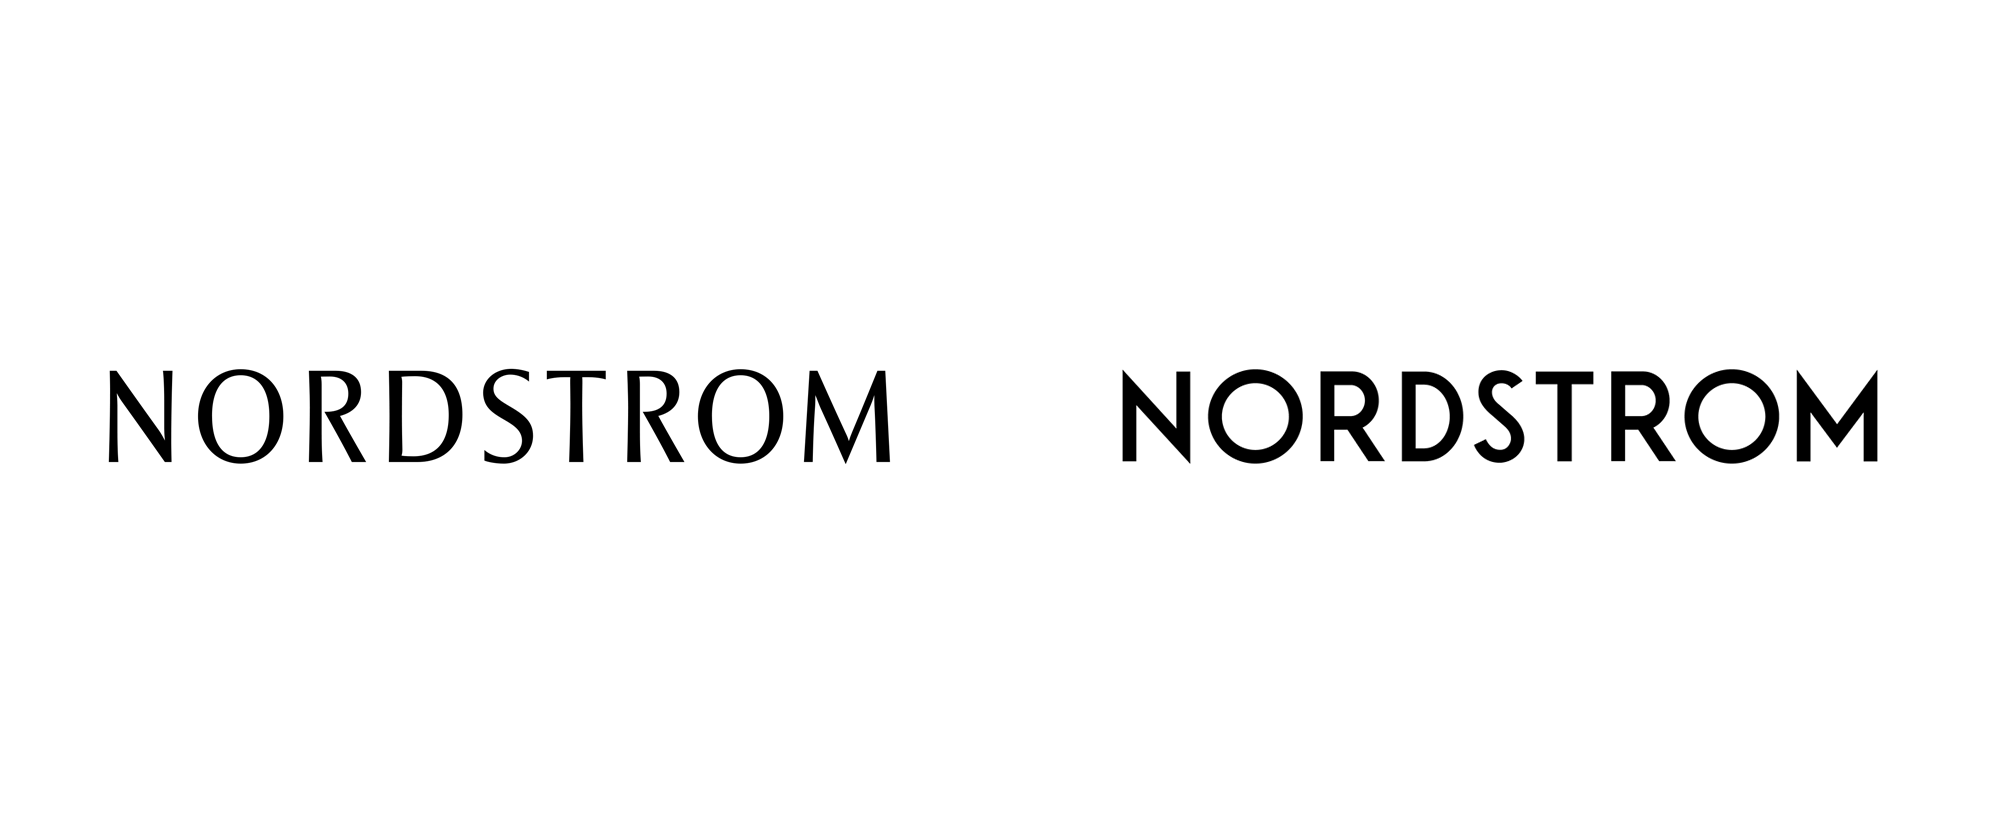 Nordstrom Company Logo